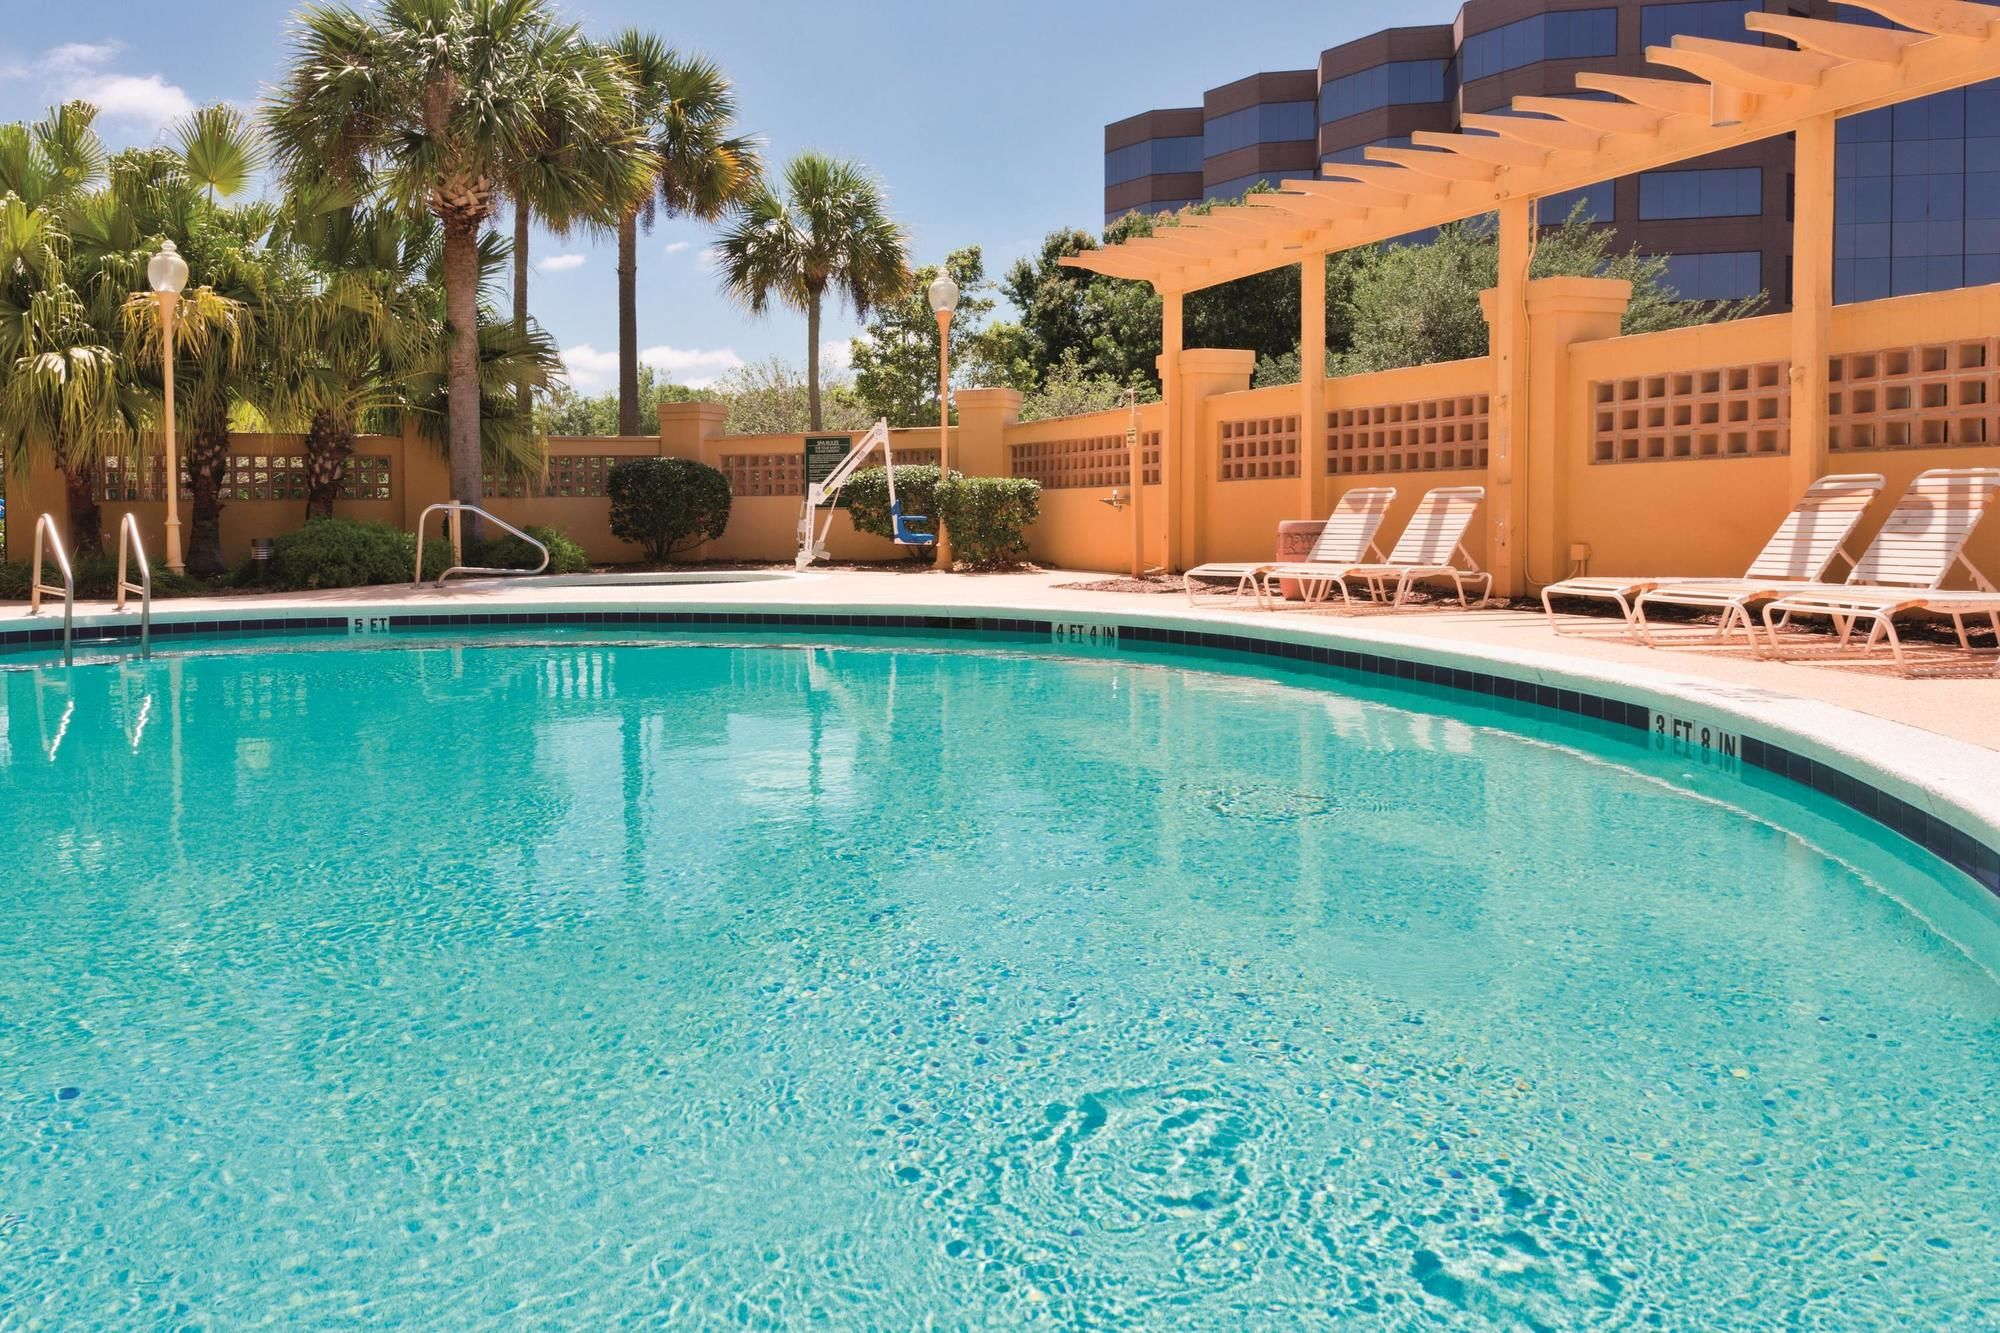 La Quinta Inn and Suites Jacksonville Butler Boulevard